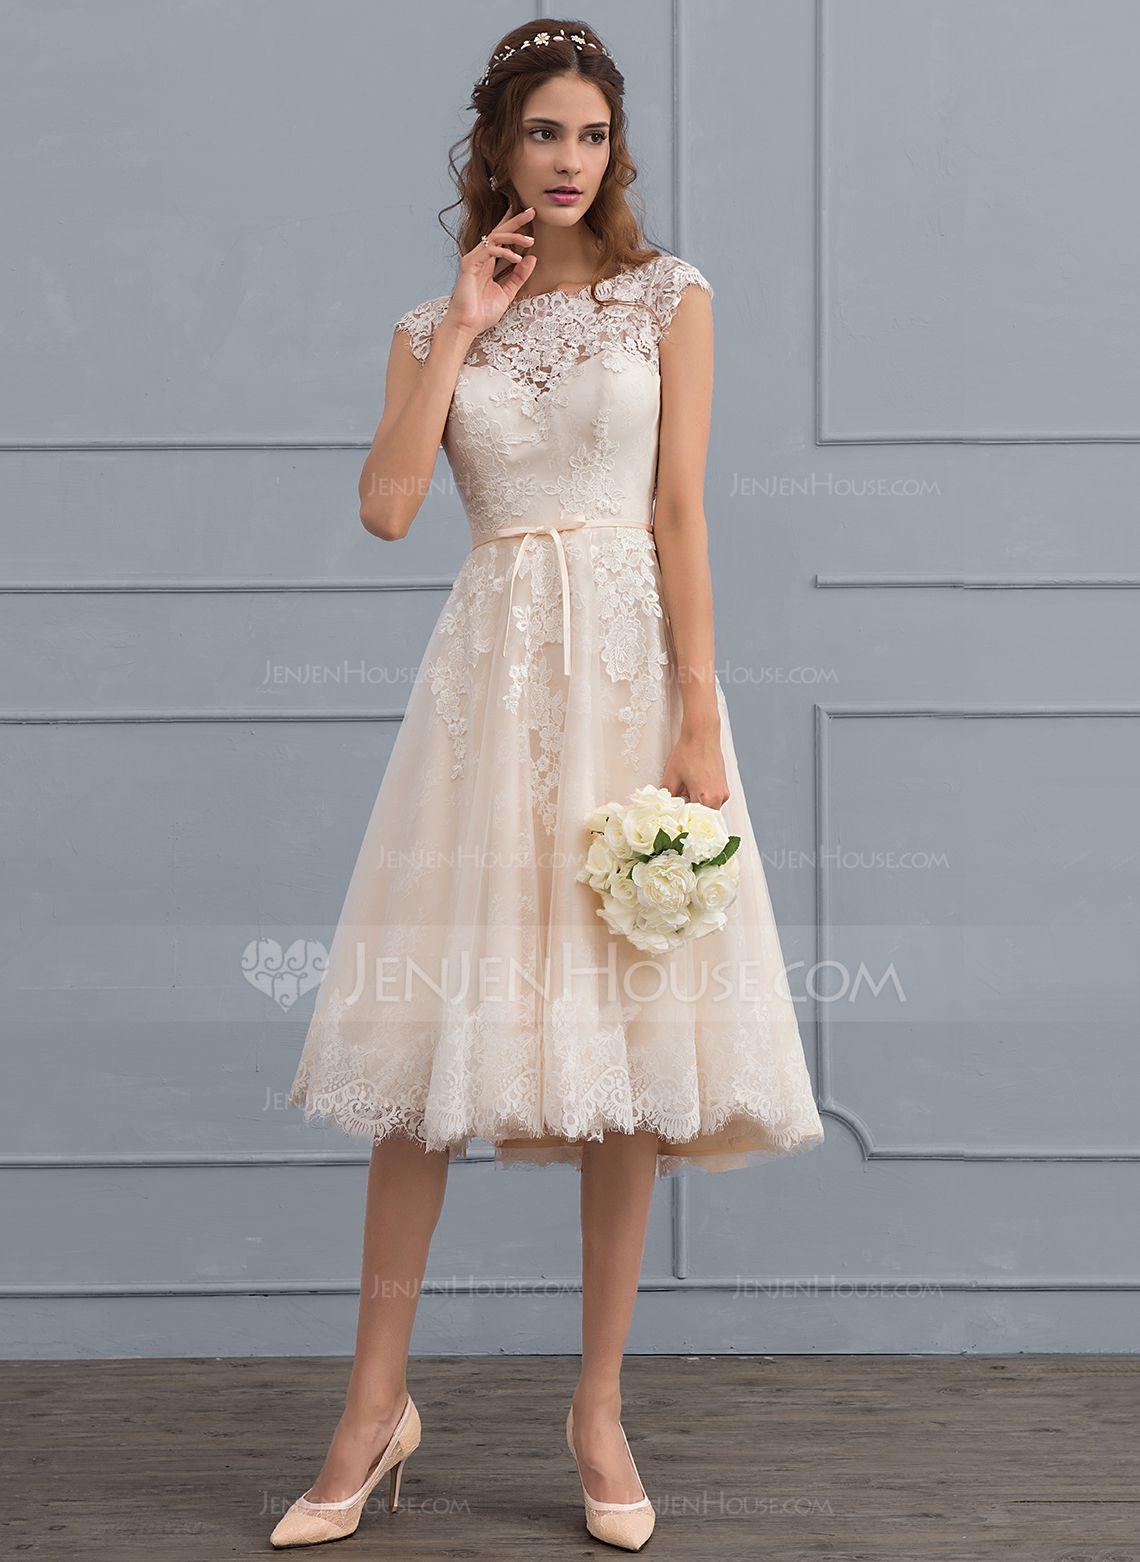 8d5559d4e65 A-Line Princess Scoop Neck Knee-Length Tulle Lace Wedding Dress With Bow(s)  (002117037) - JenJenHouse